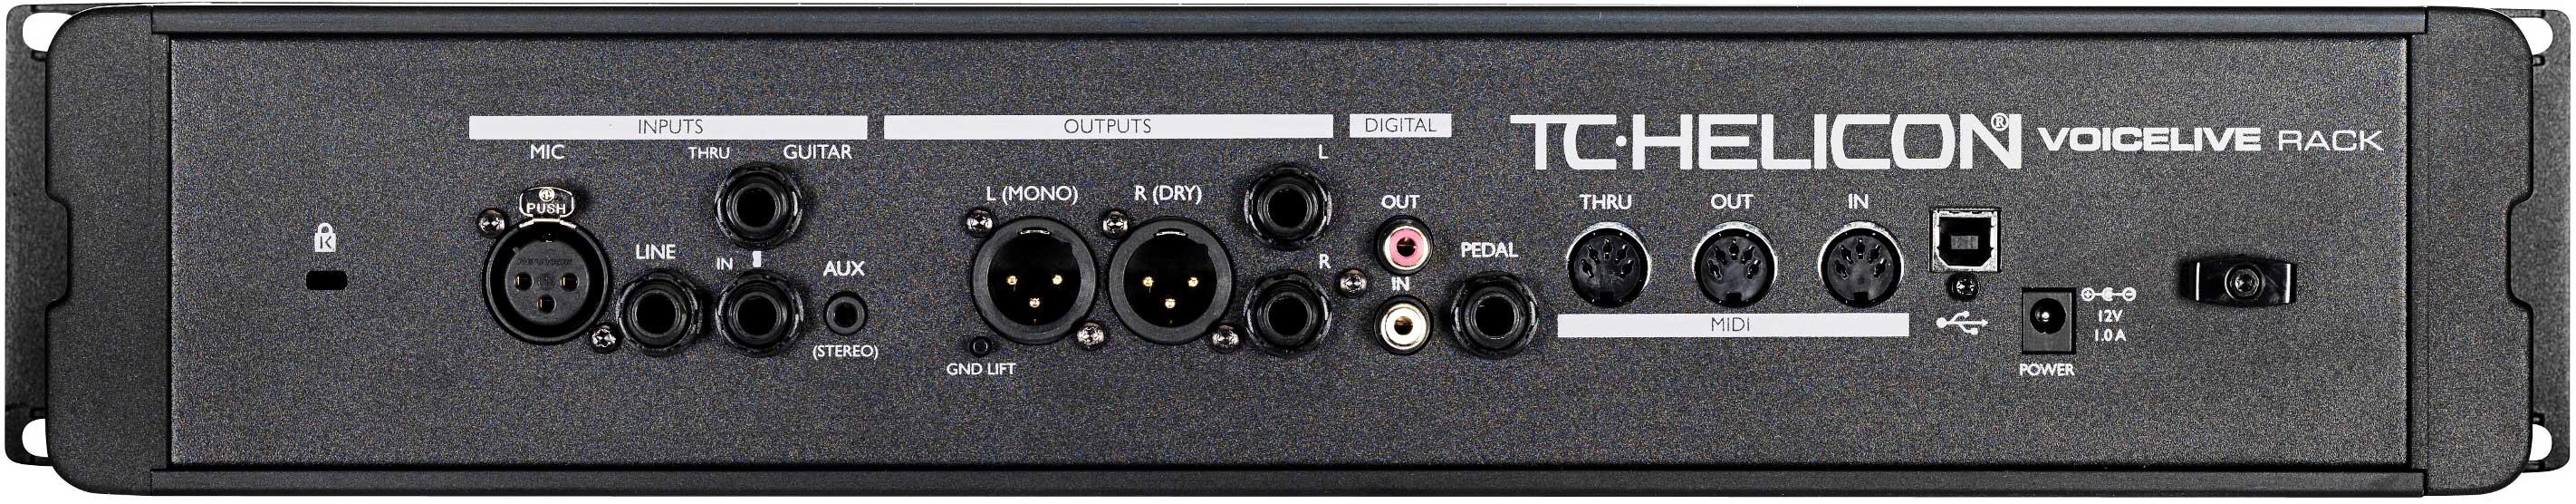 Processor, Vocal Rack Unit